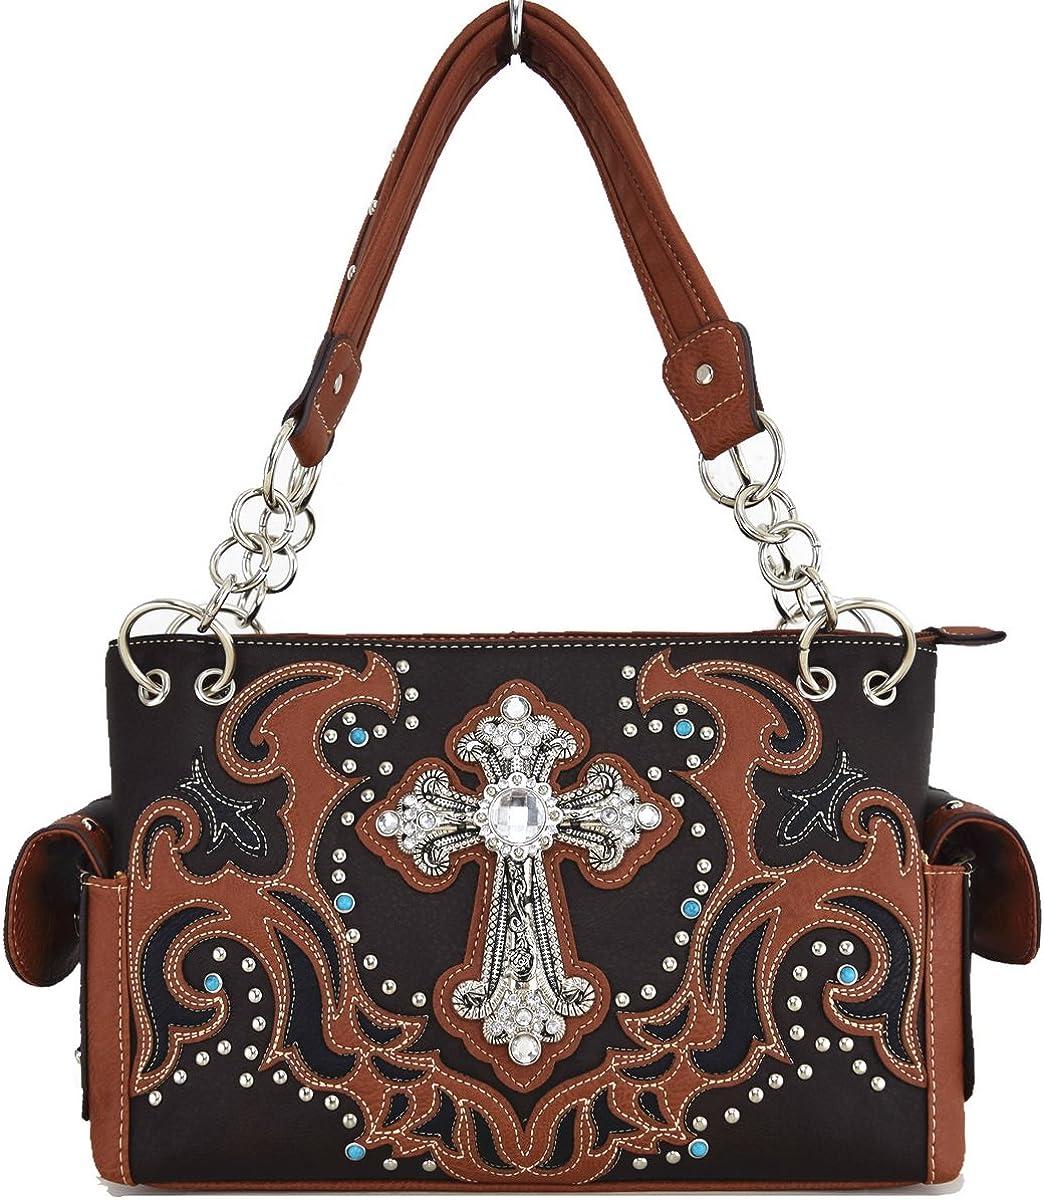 Womens Religious PU Leather Fashion Elegant Bag Purse 70%OFFアウトレット 店内限界値引き中&セルフラッピング無料